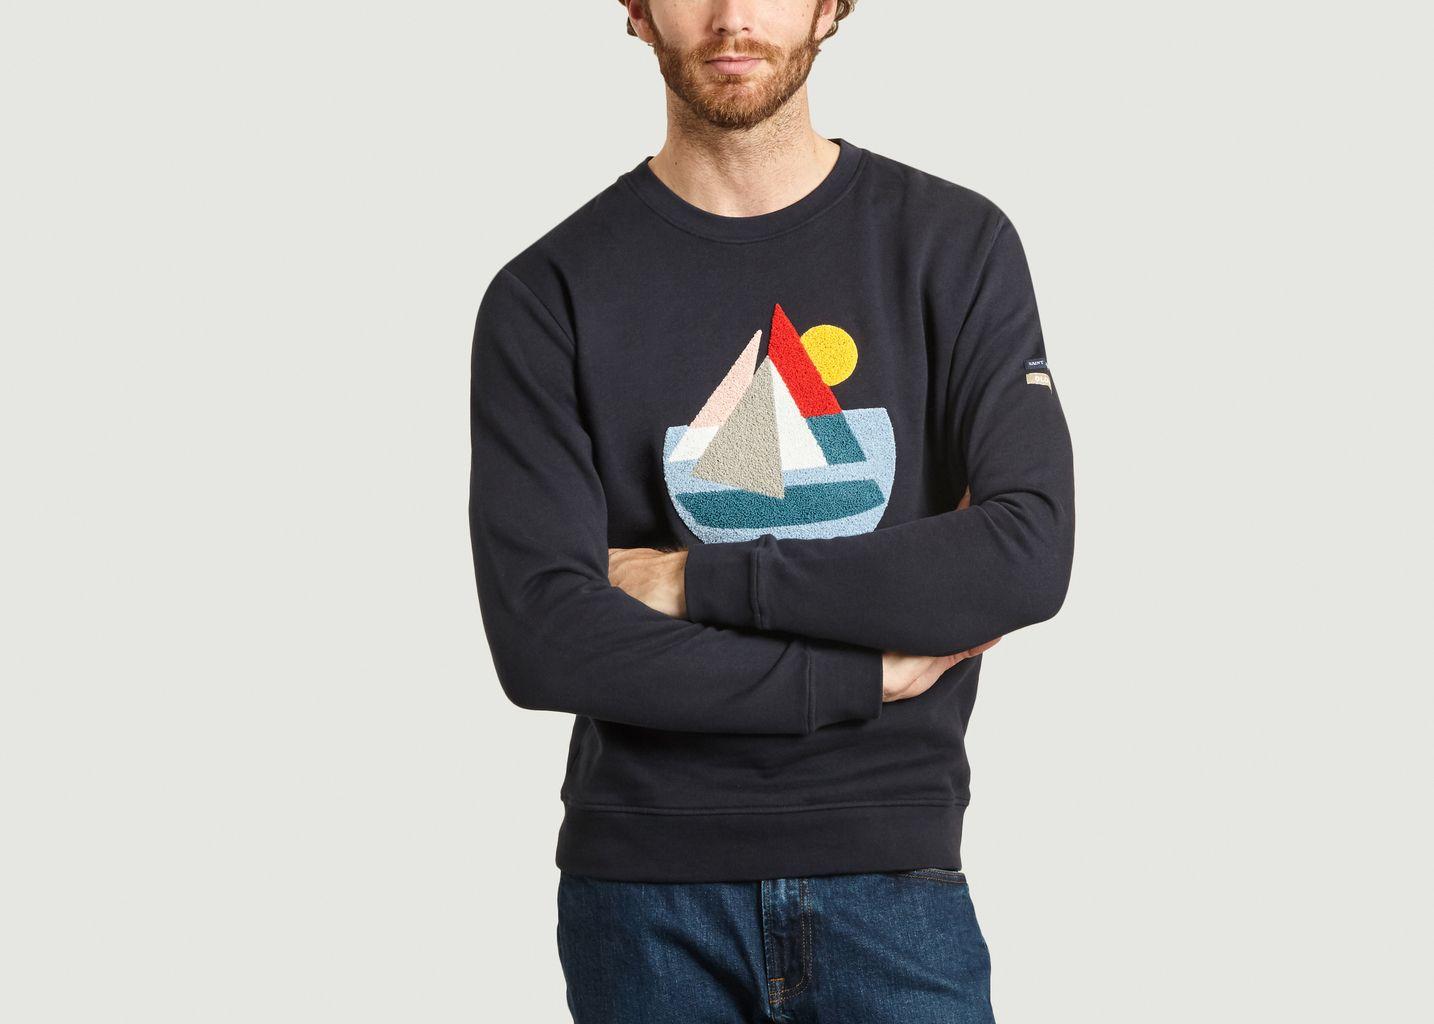 Sweatshirt brodé en coton bio Gremant Olow x Saint James - Olow